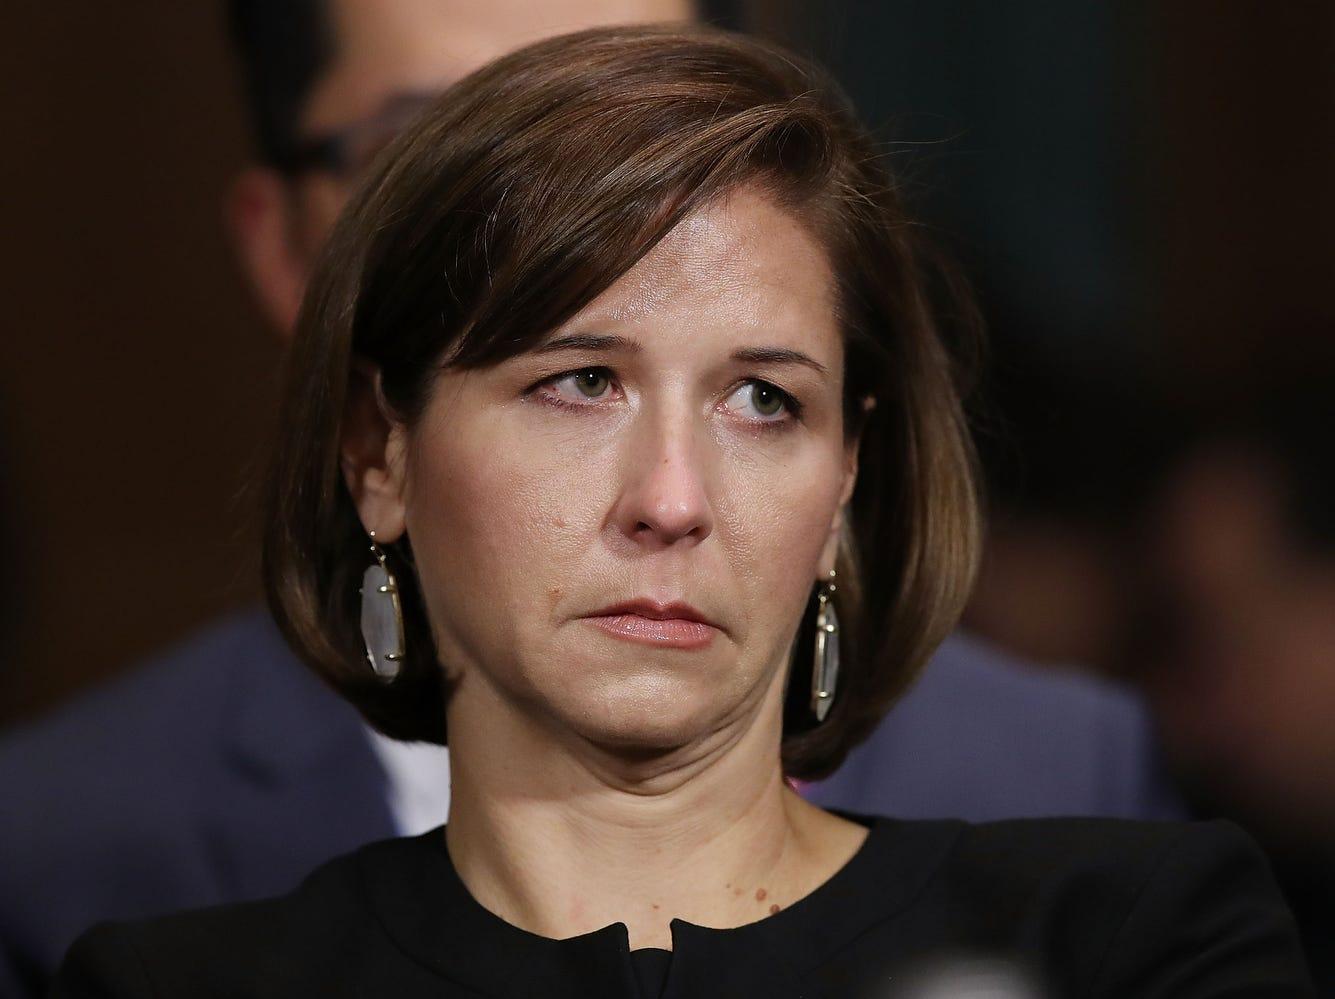 Ashley Kavanaugh listens to her husband, Judge Brett Kavanaugh testify before the Senate Judiciary Committee.